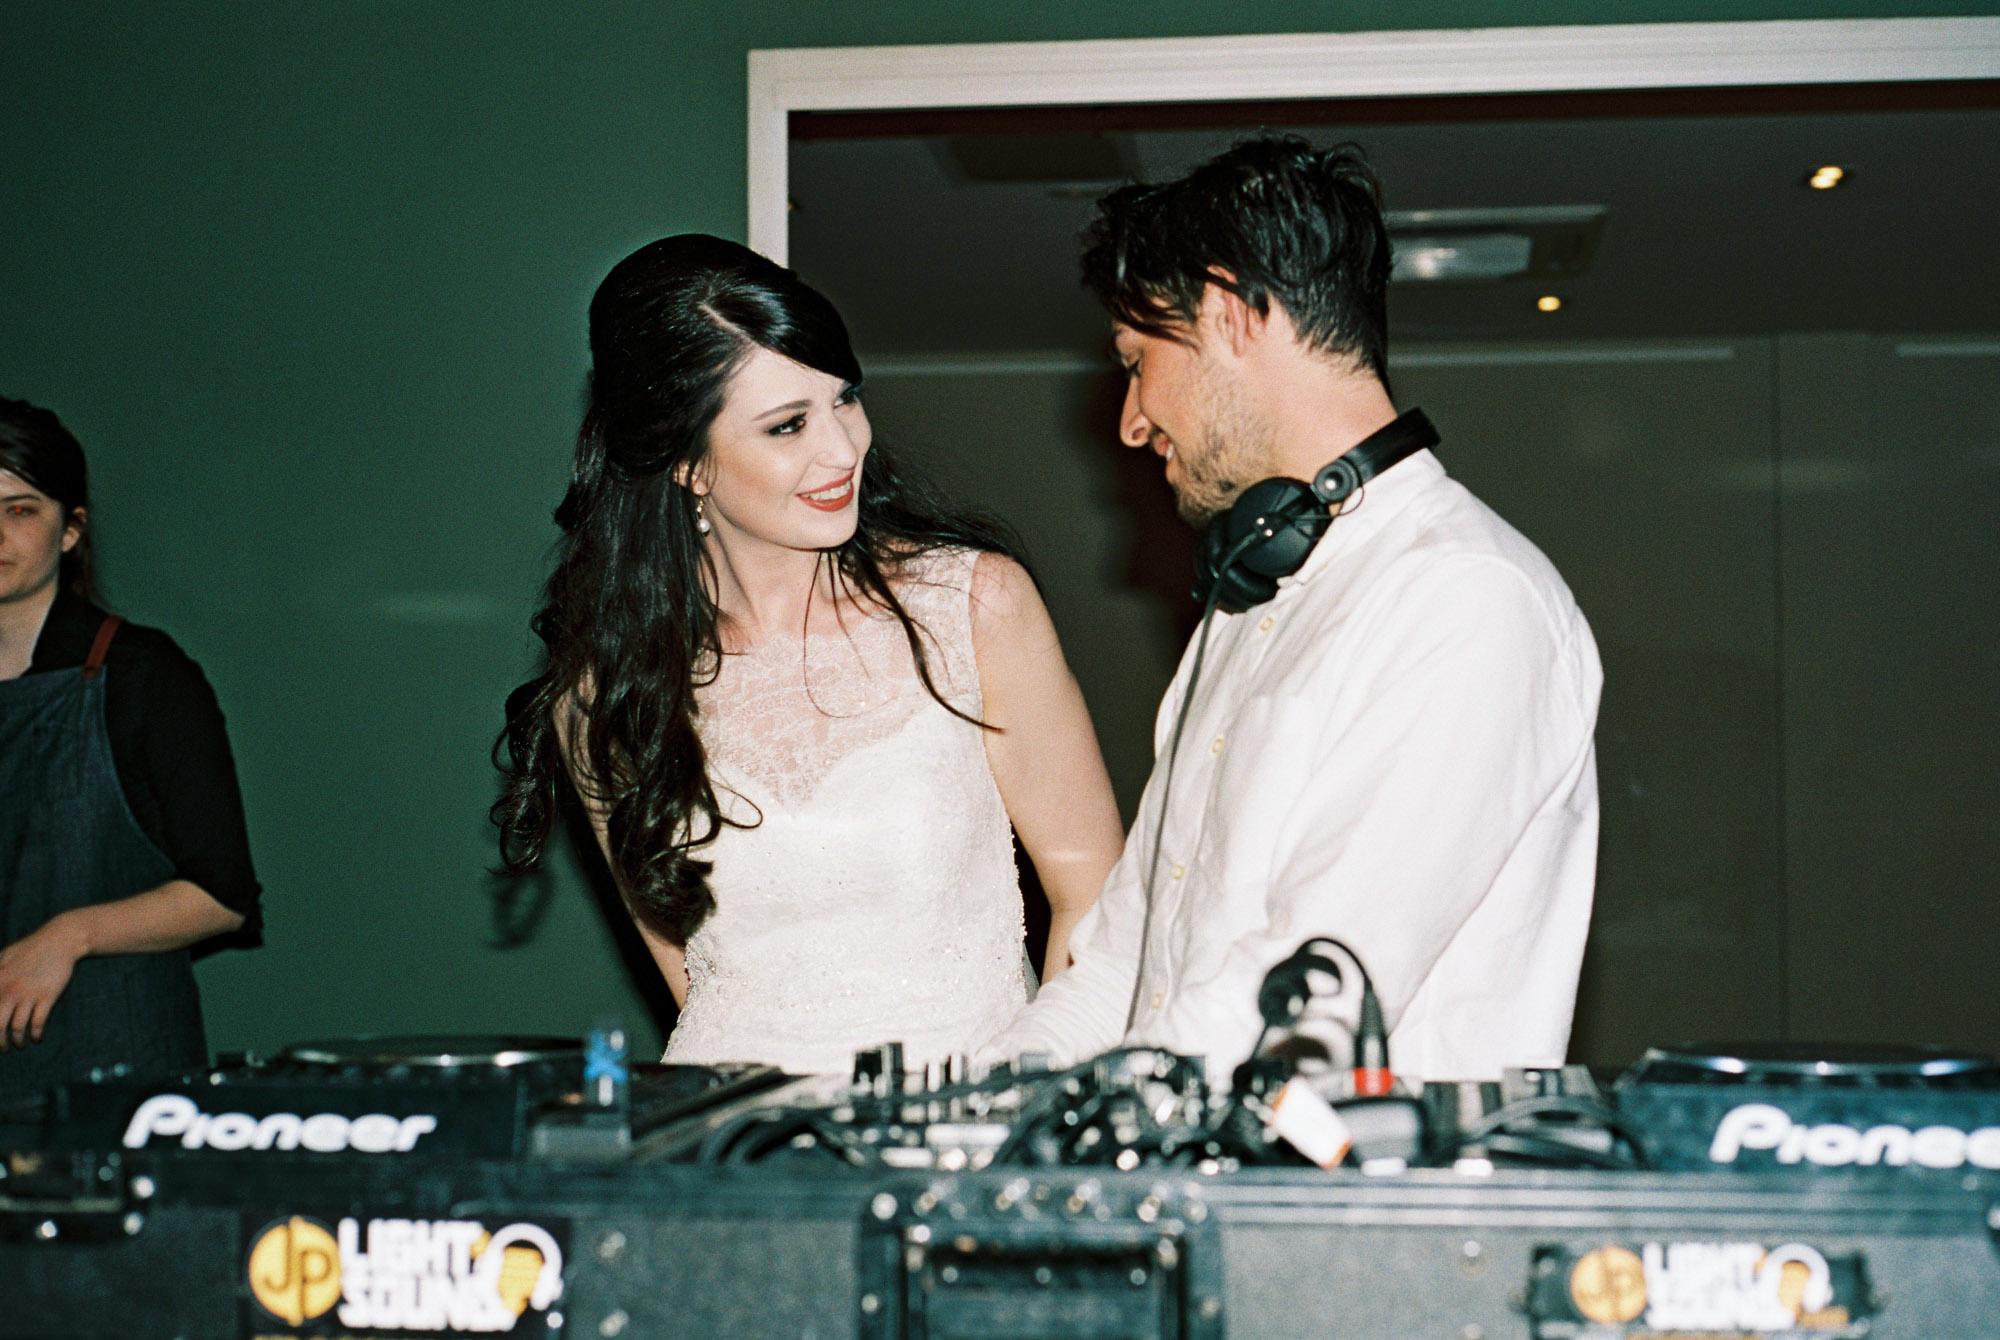 Glen-Ewin-Estate-wedding-photography-101.jpg